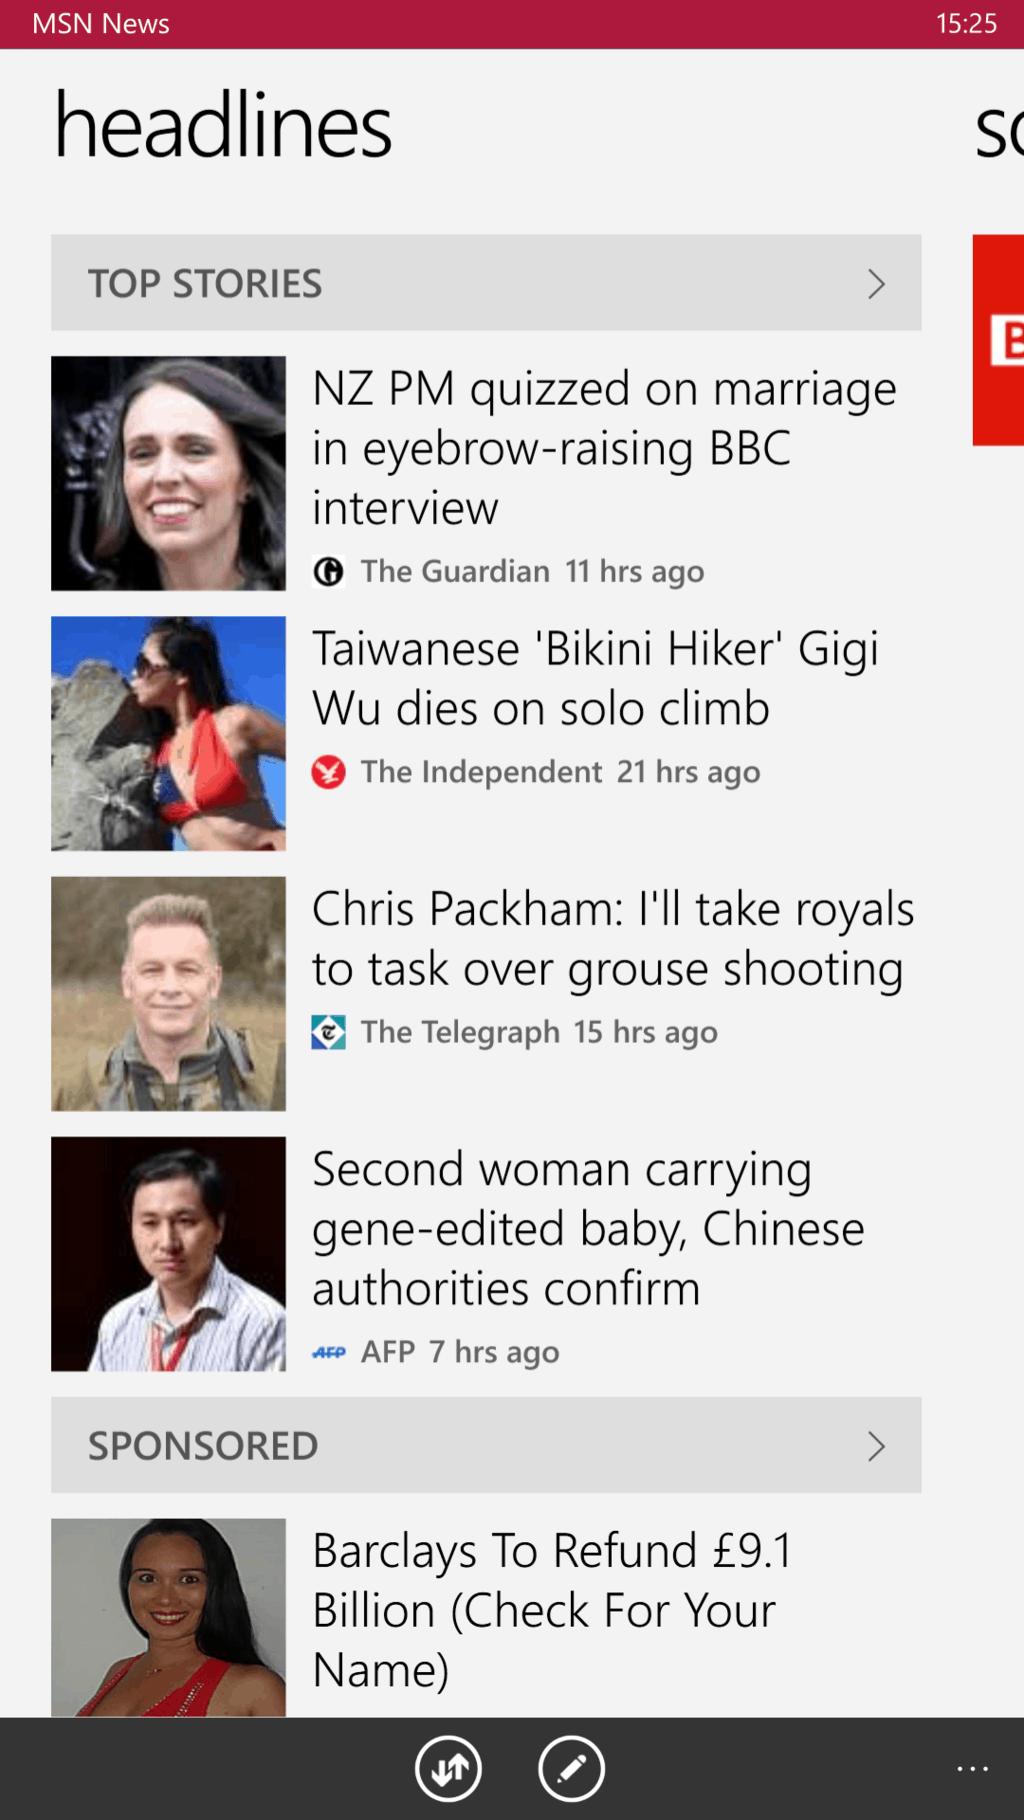 Msn news v3 on windows 10 mobile